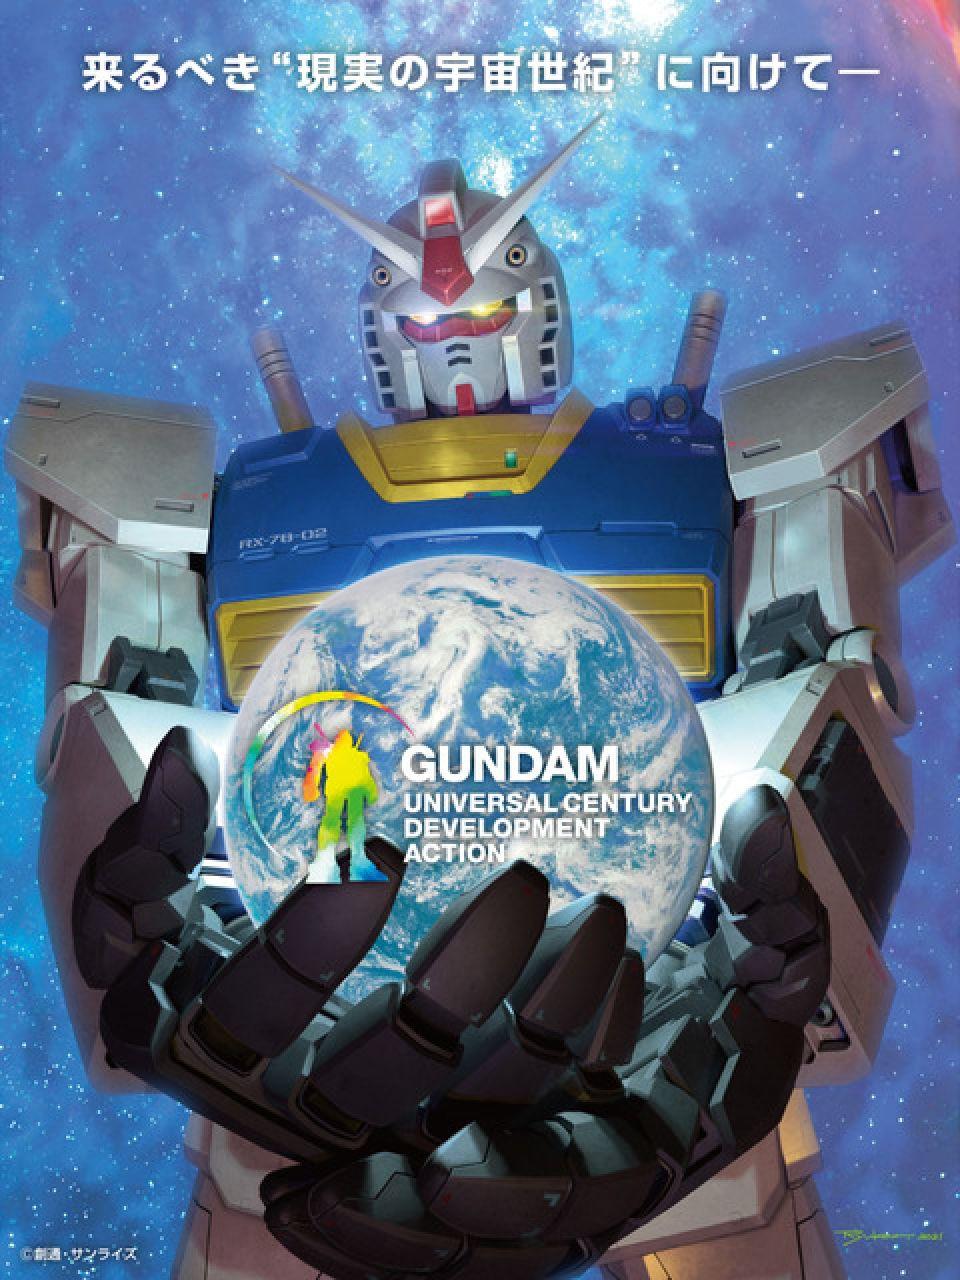 gundam universal century development action poster